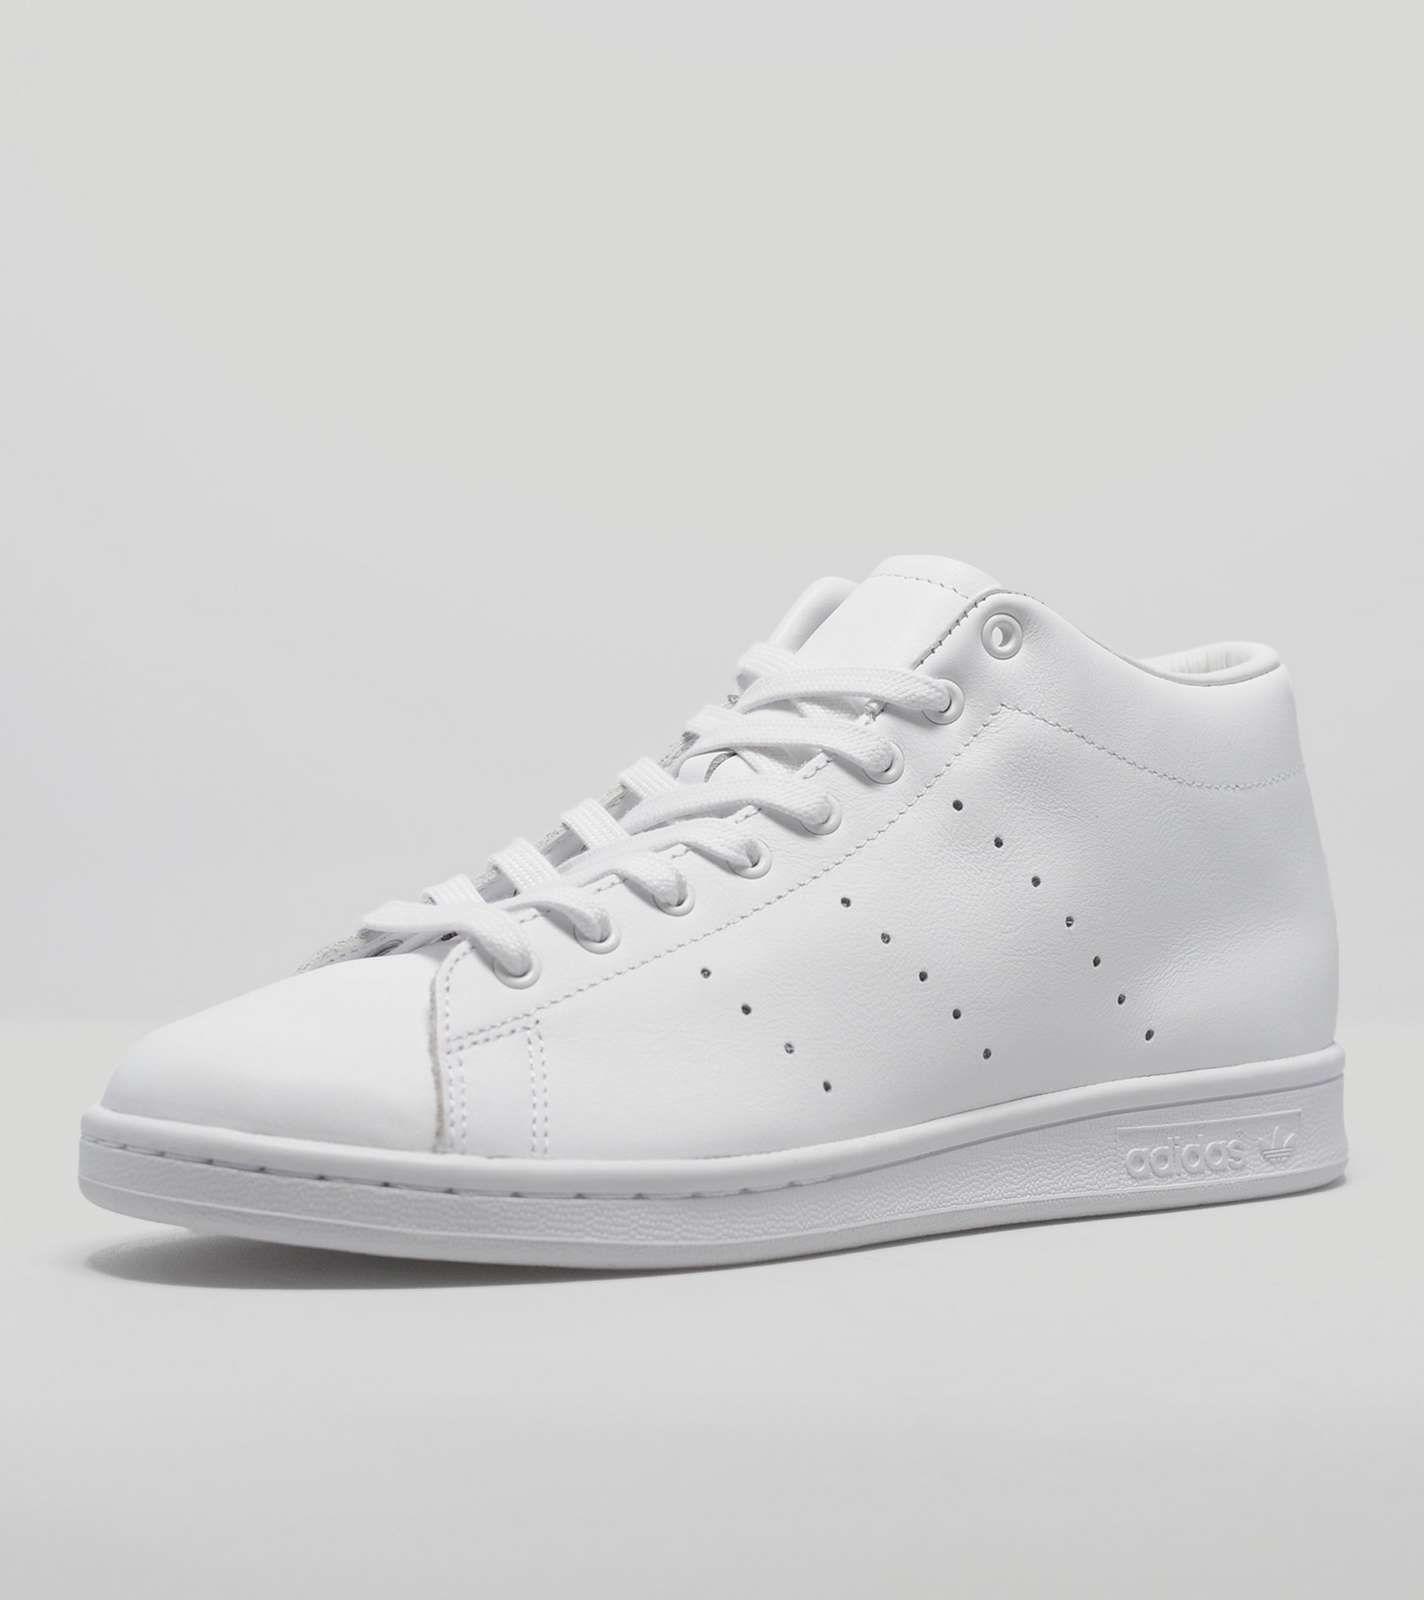 adidas Originals by HYKE AOH-001 HI | Size?